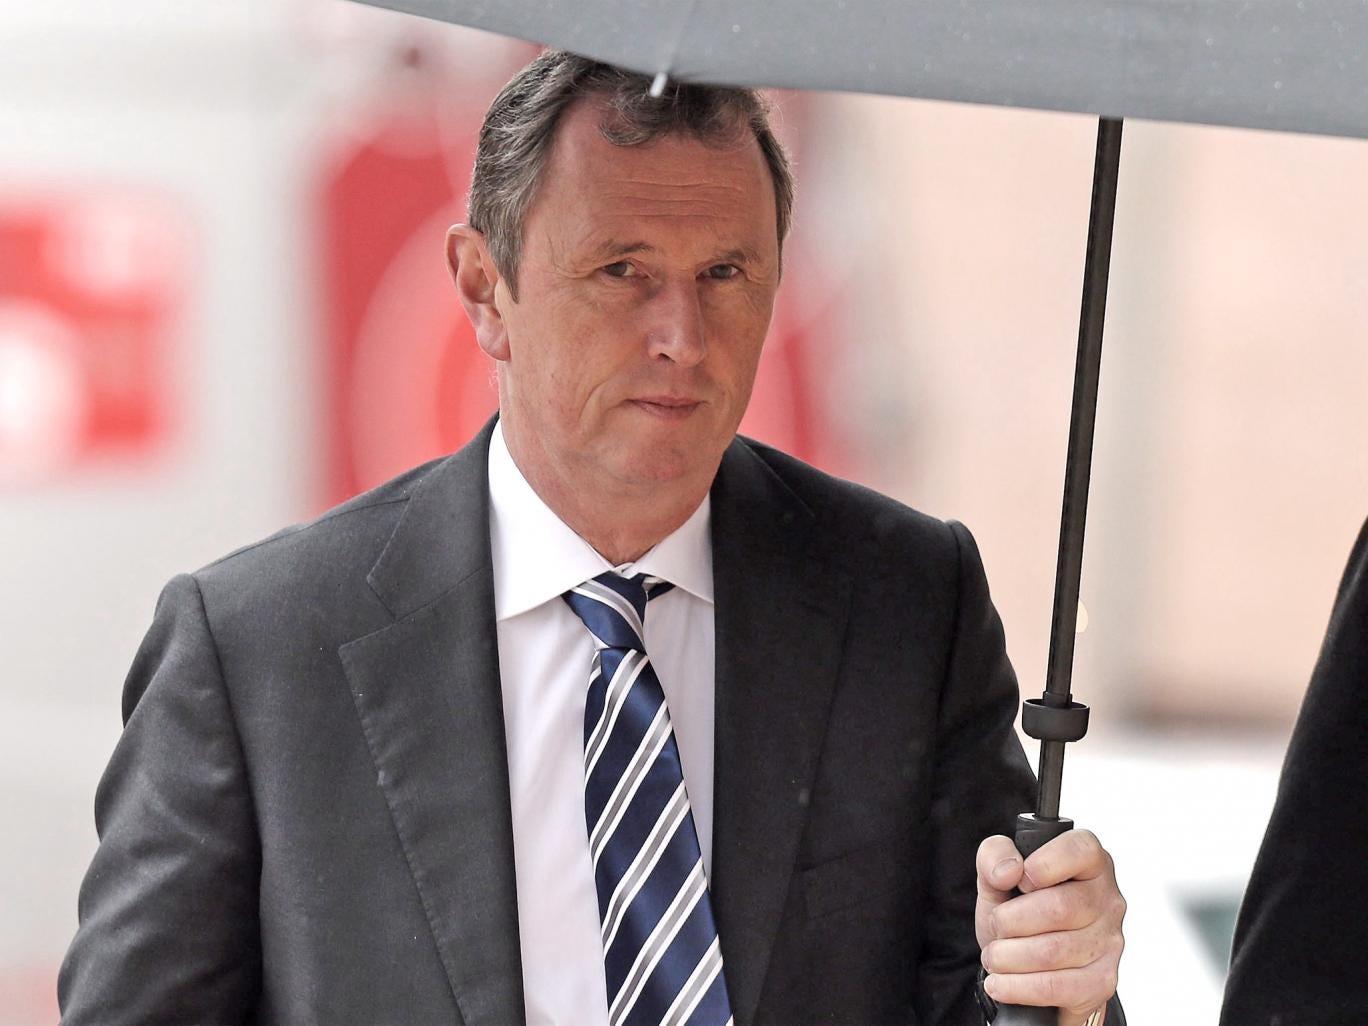 Former deputy speaker of the House of Commons Nigel Evans arrives at Preston Crown Court